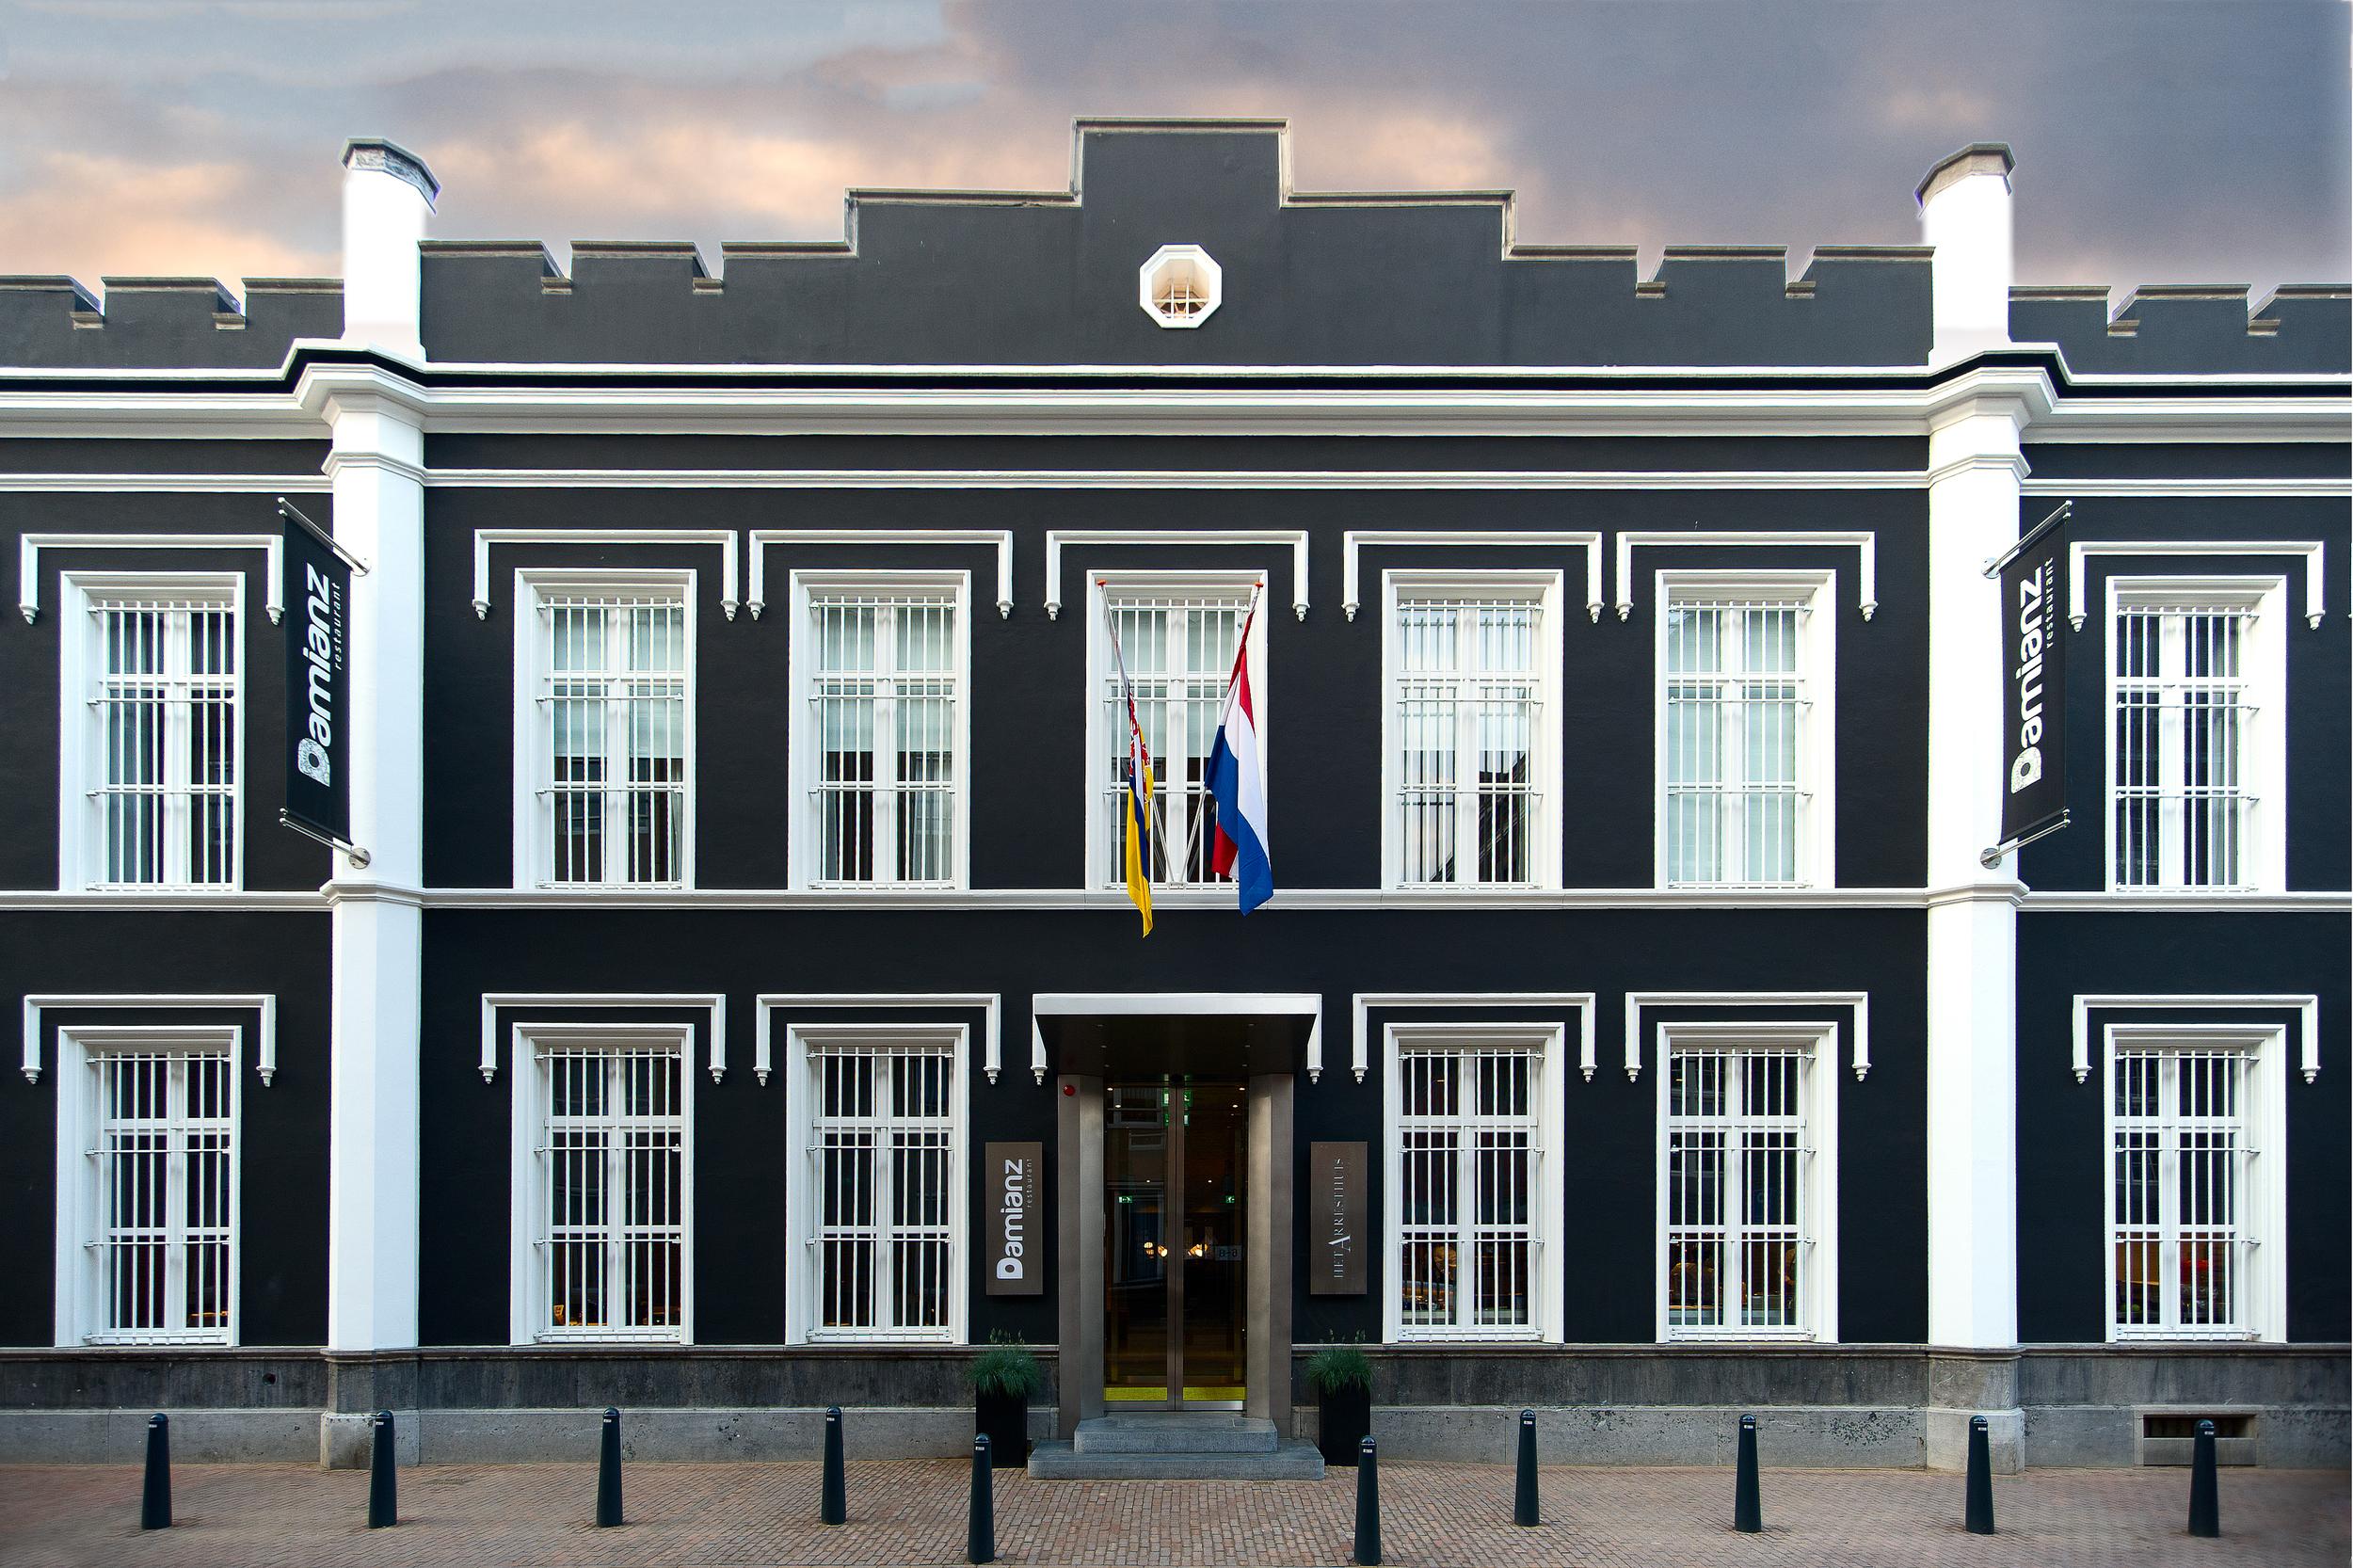 Archi.ext_Het_Arresthuis_20110509_0001-Edit.jpg